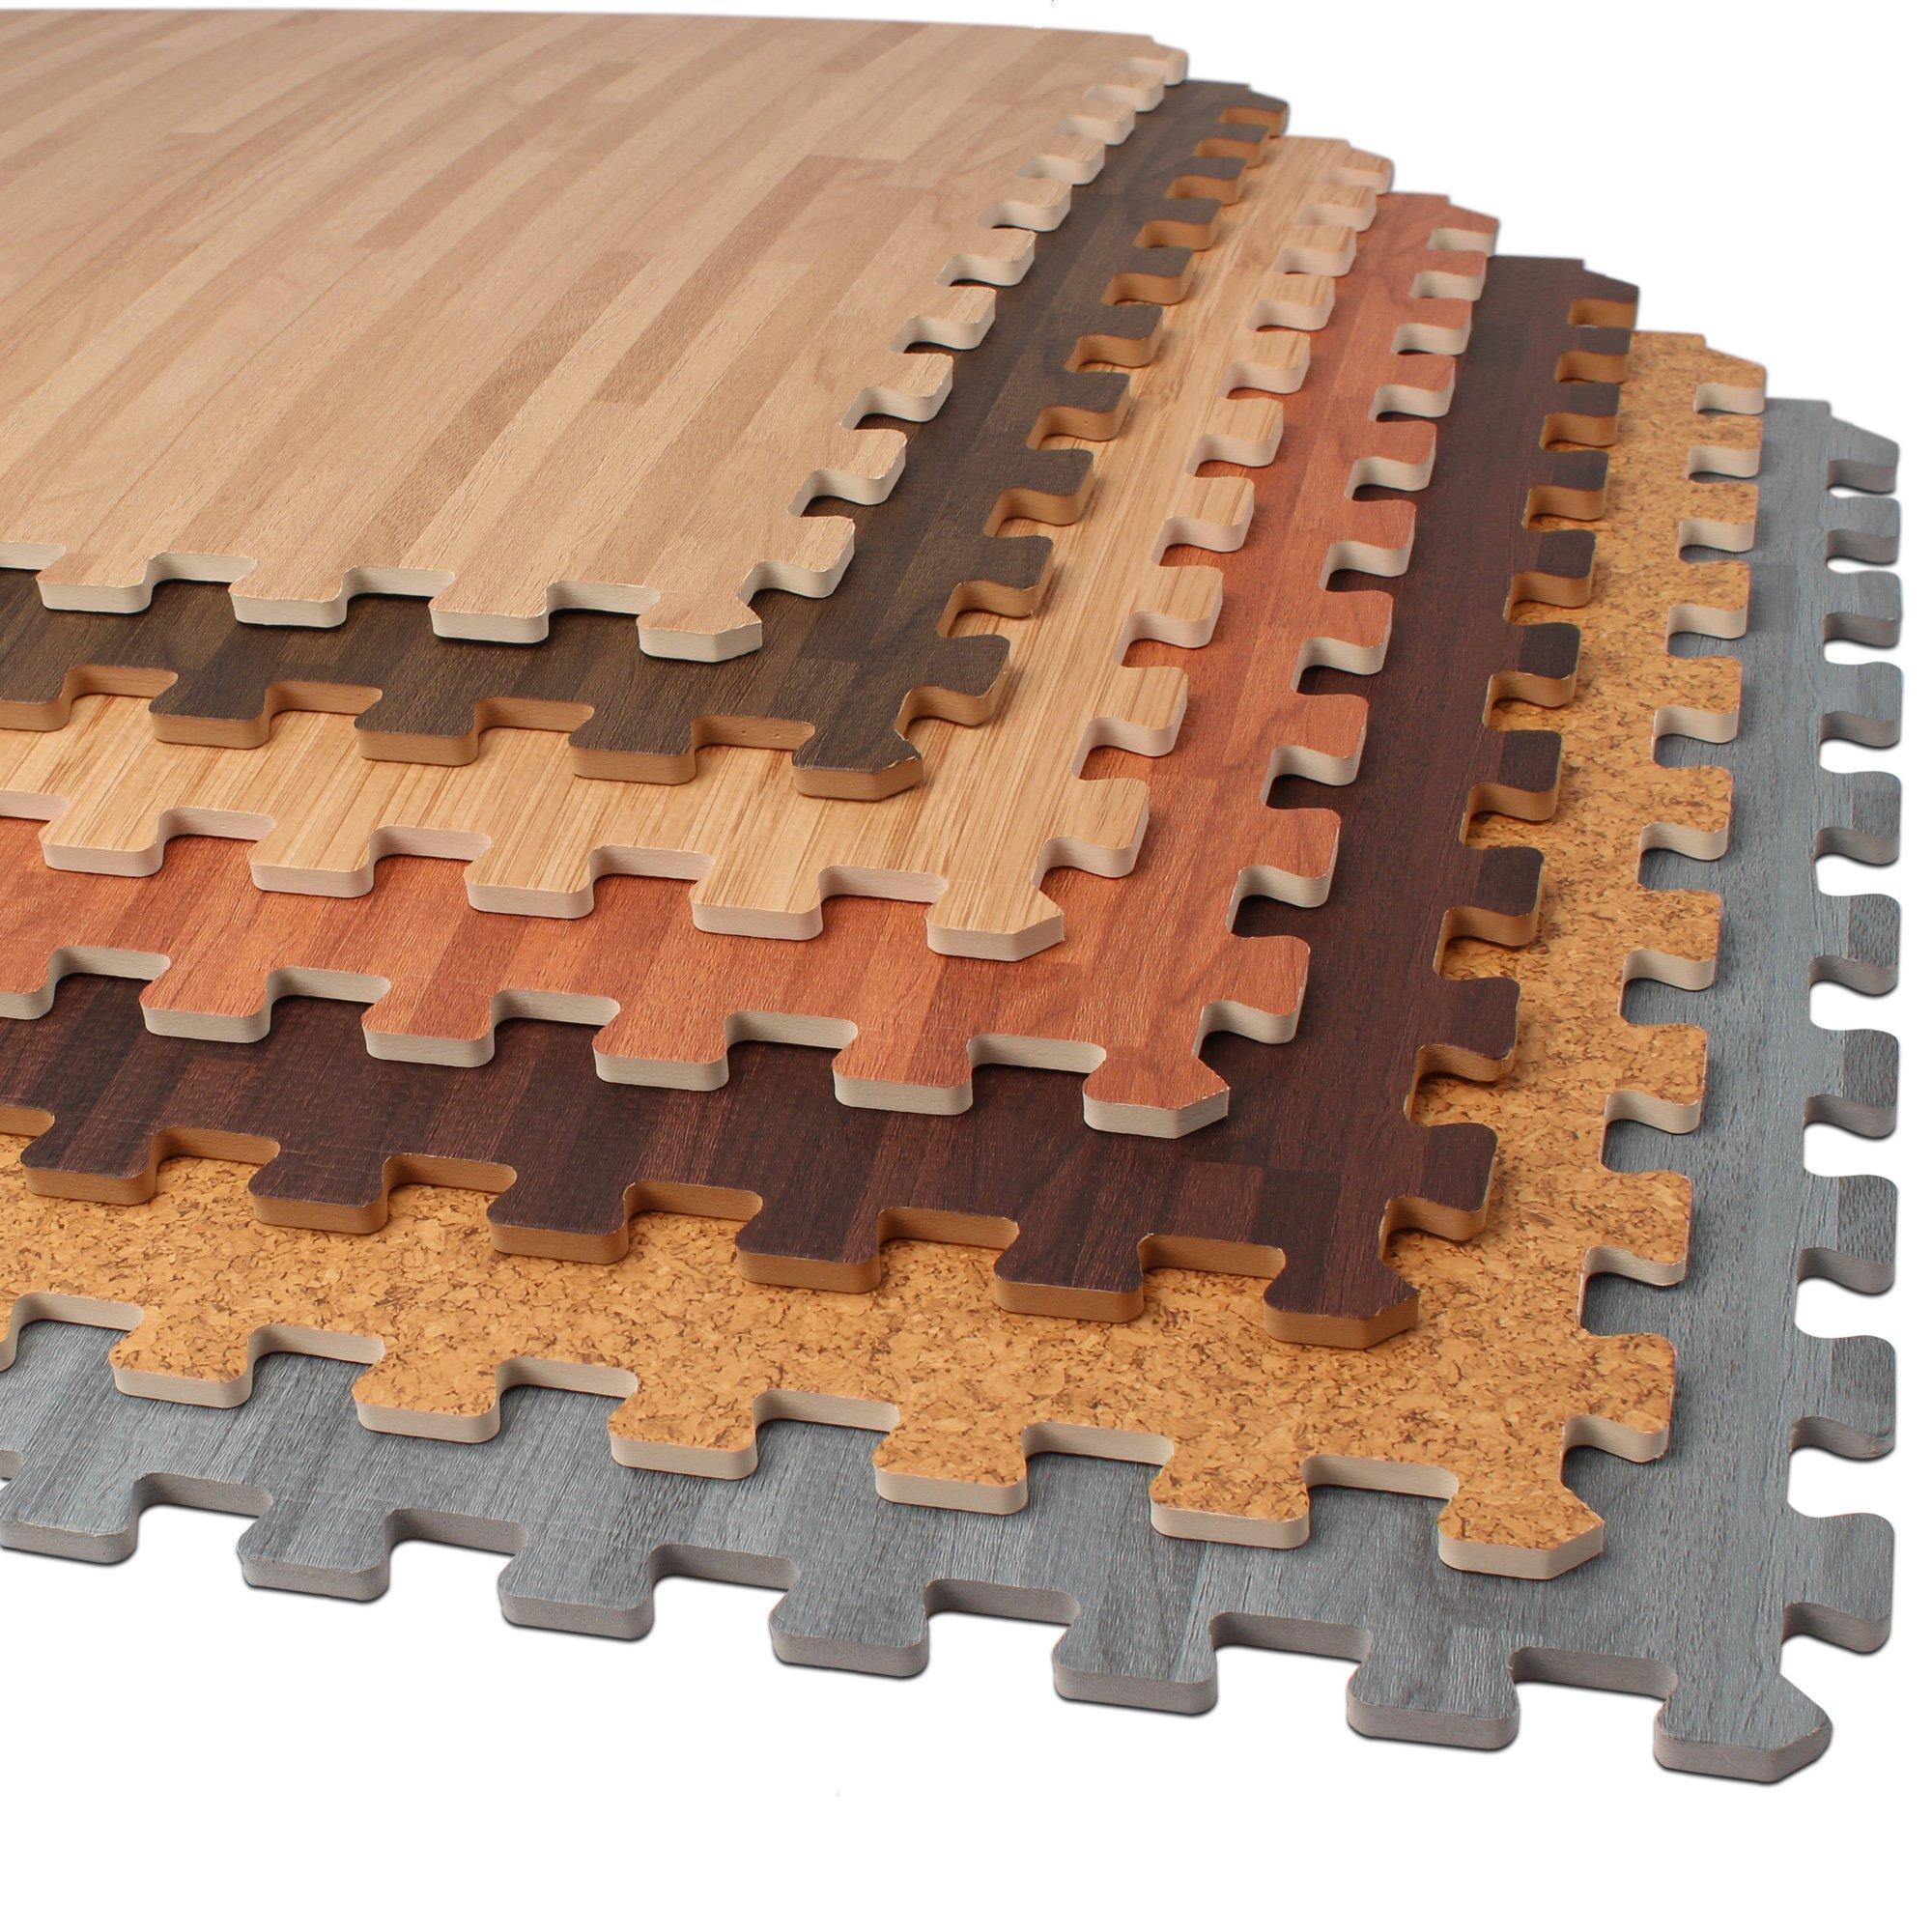 Forest Floor 3/8'' Thick Printed Wood Grain Interlocking Foam Floor Mats, 16 Sq Ft (4 Tiles), Cherry